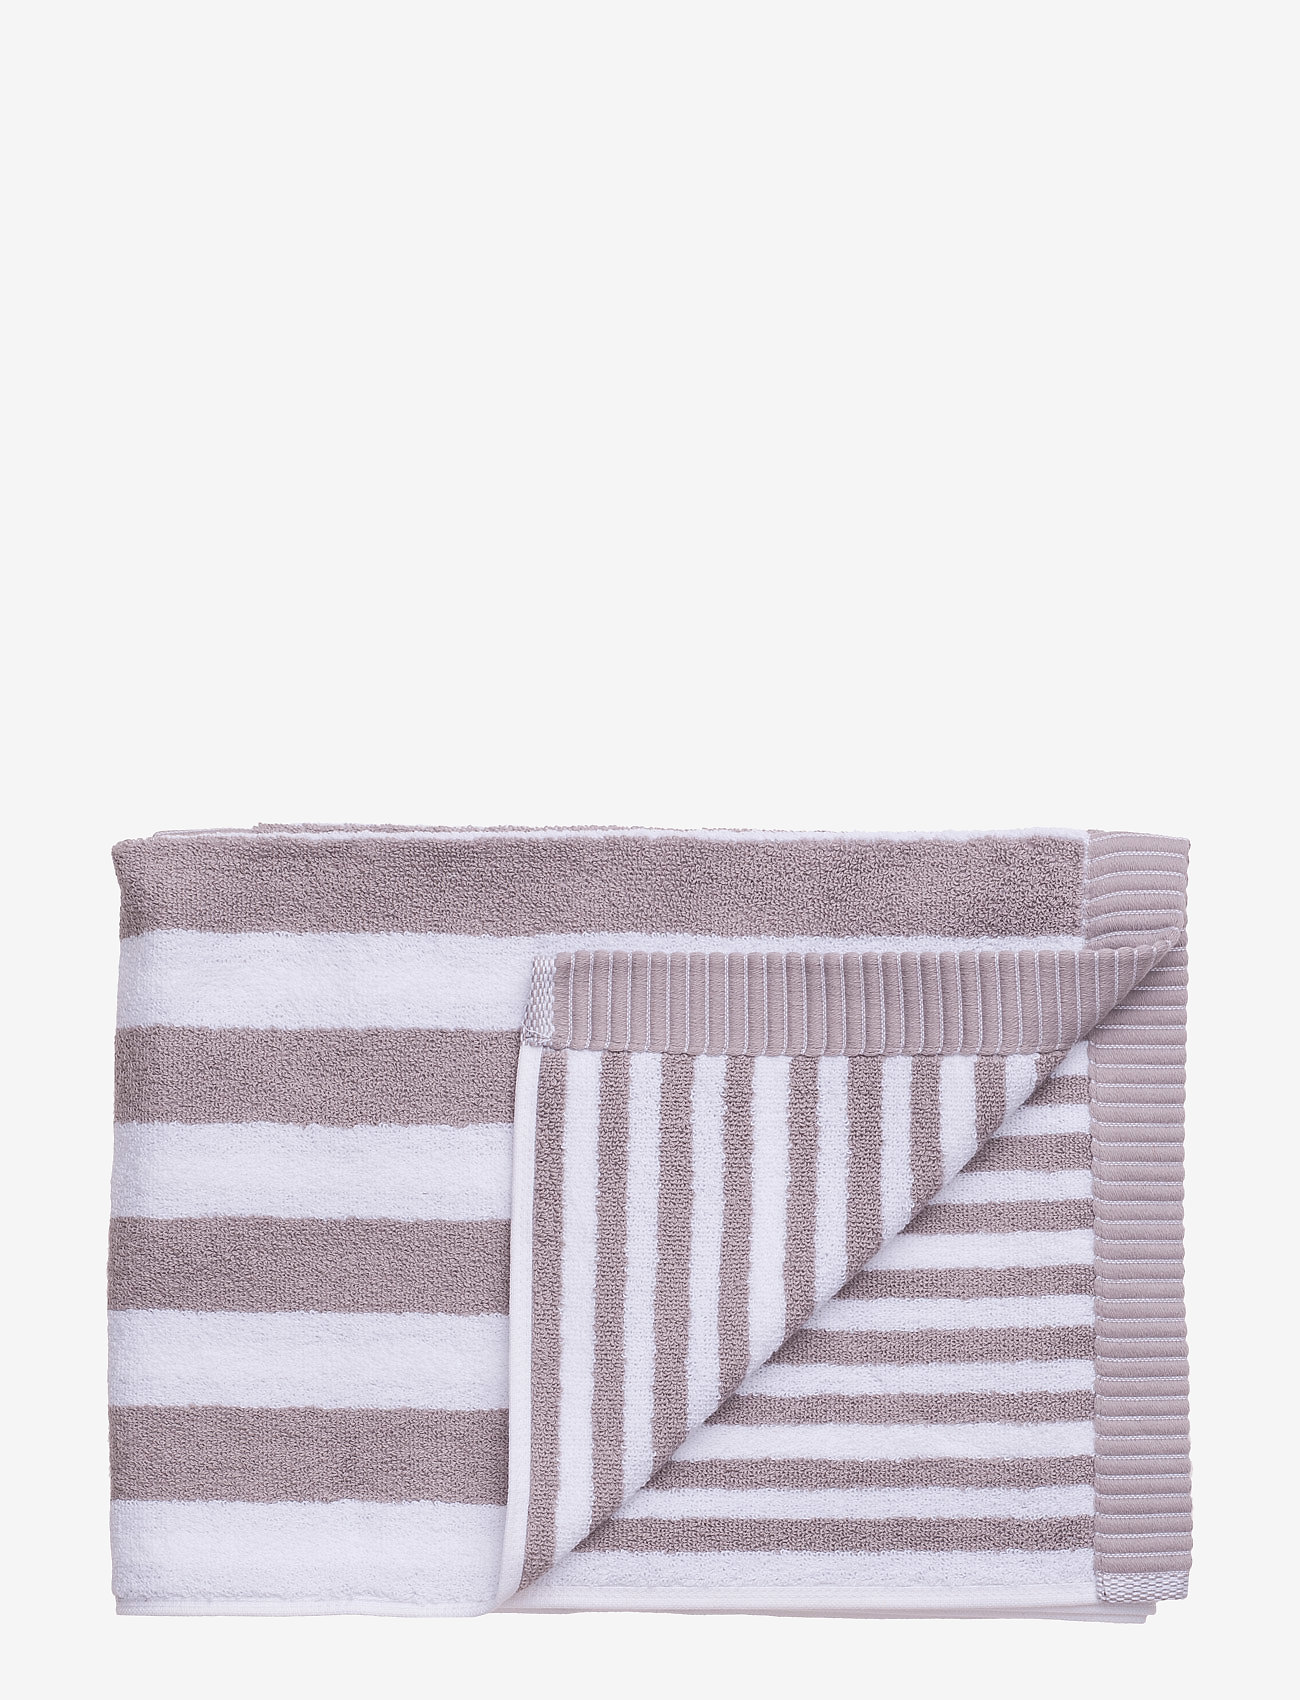 Marimekko Home - KAKSI RAITAA BATH TOWEL - ręczniki kąpielowe - grey, white - 0